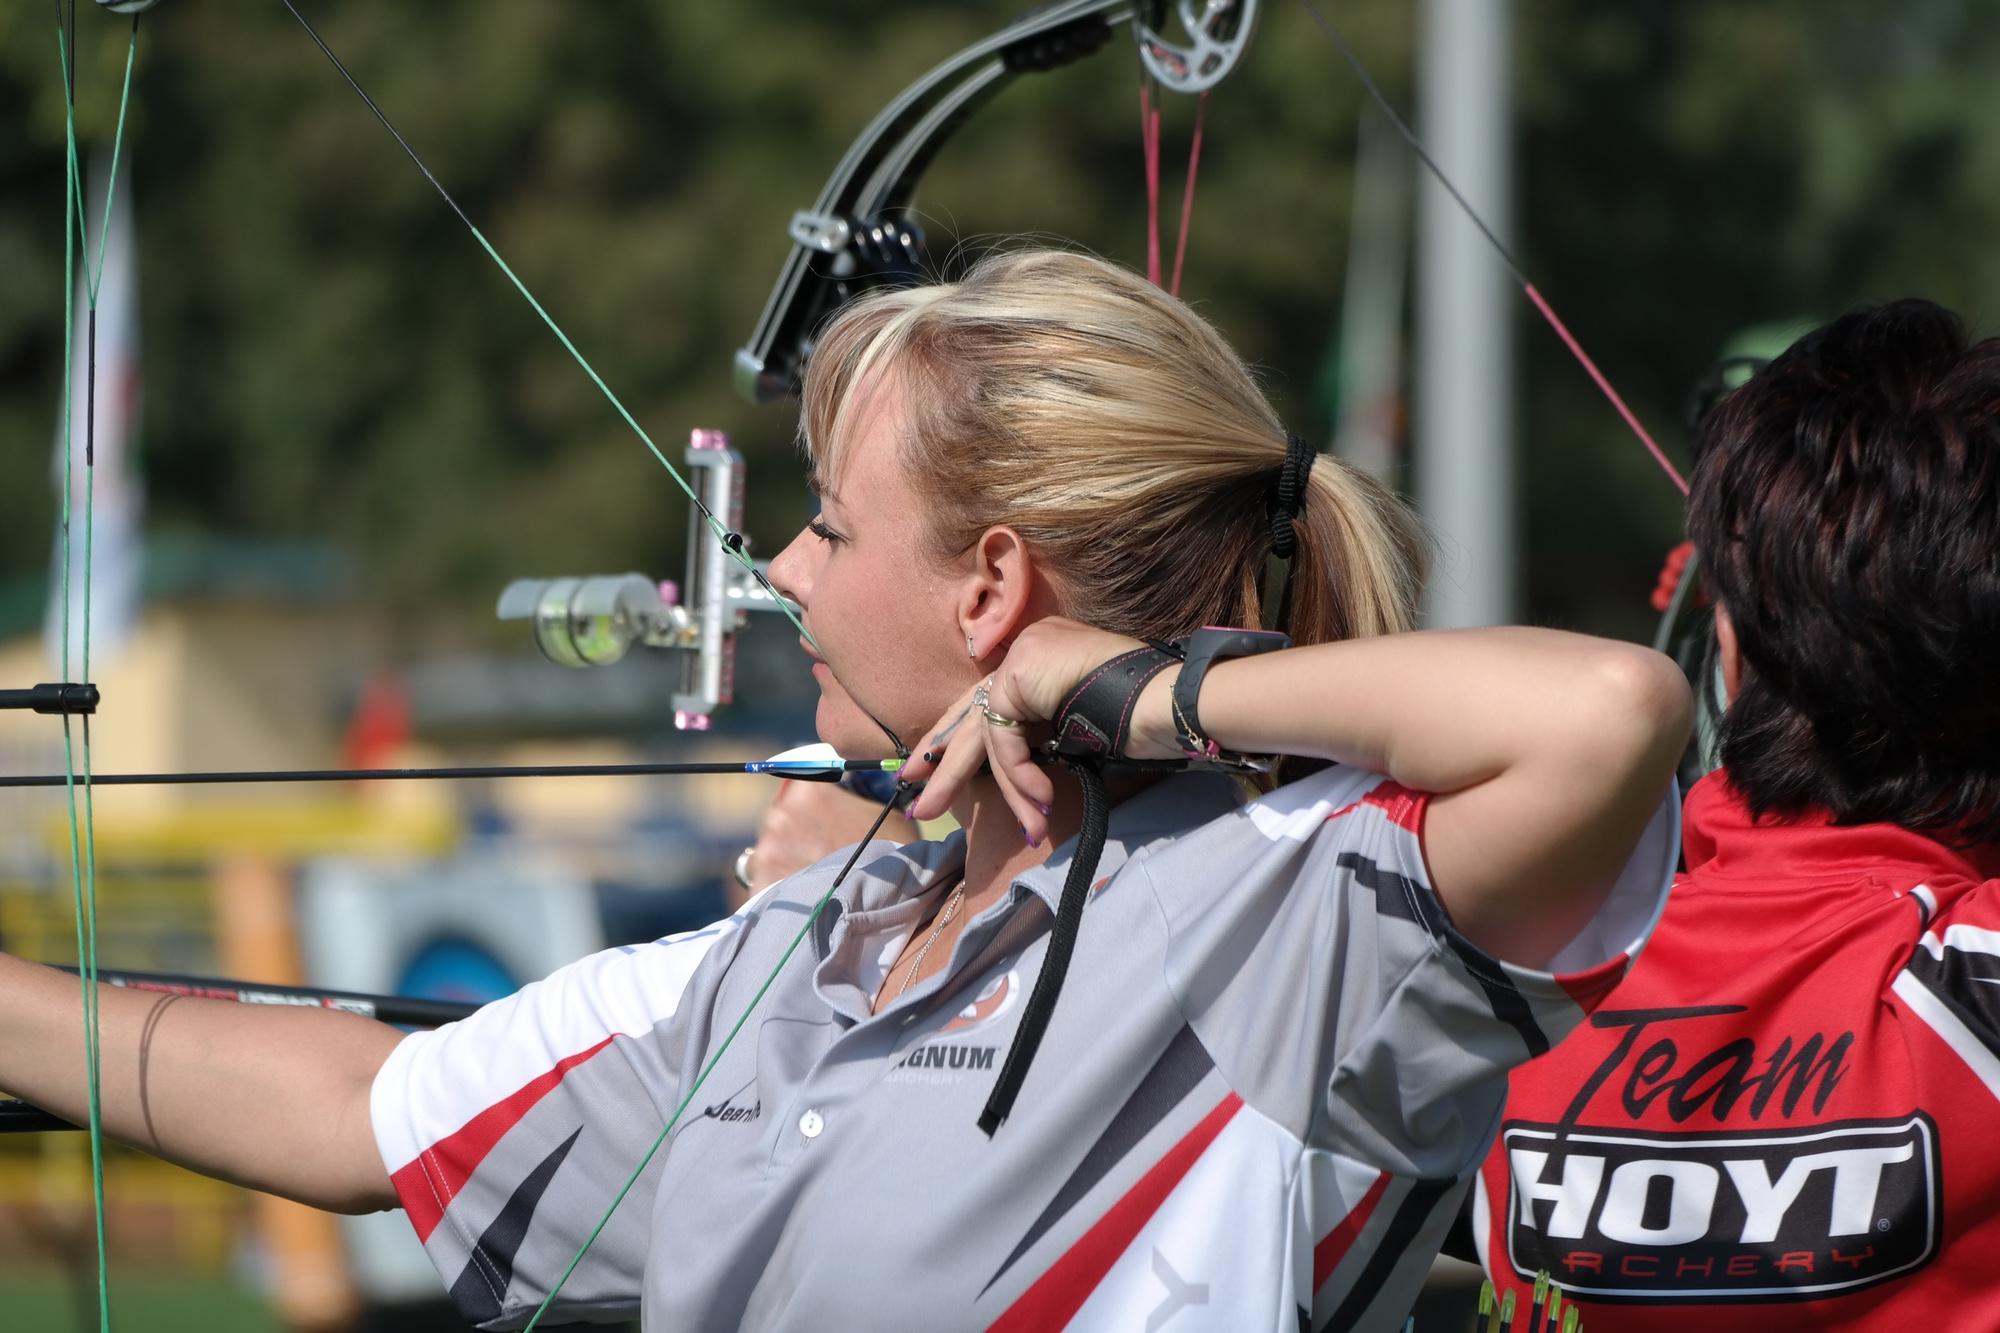 Straight-shooting Van Kradenburg keeps on nailing the big scores